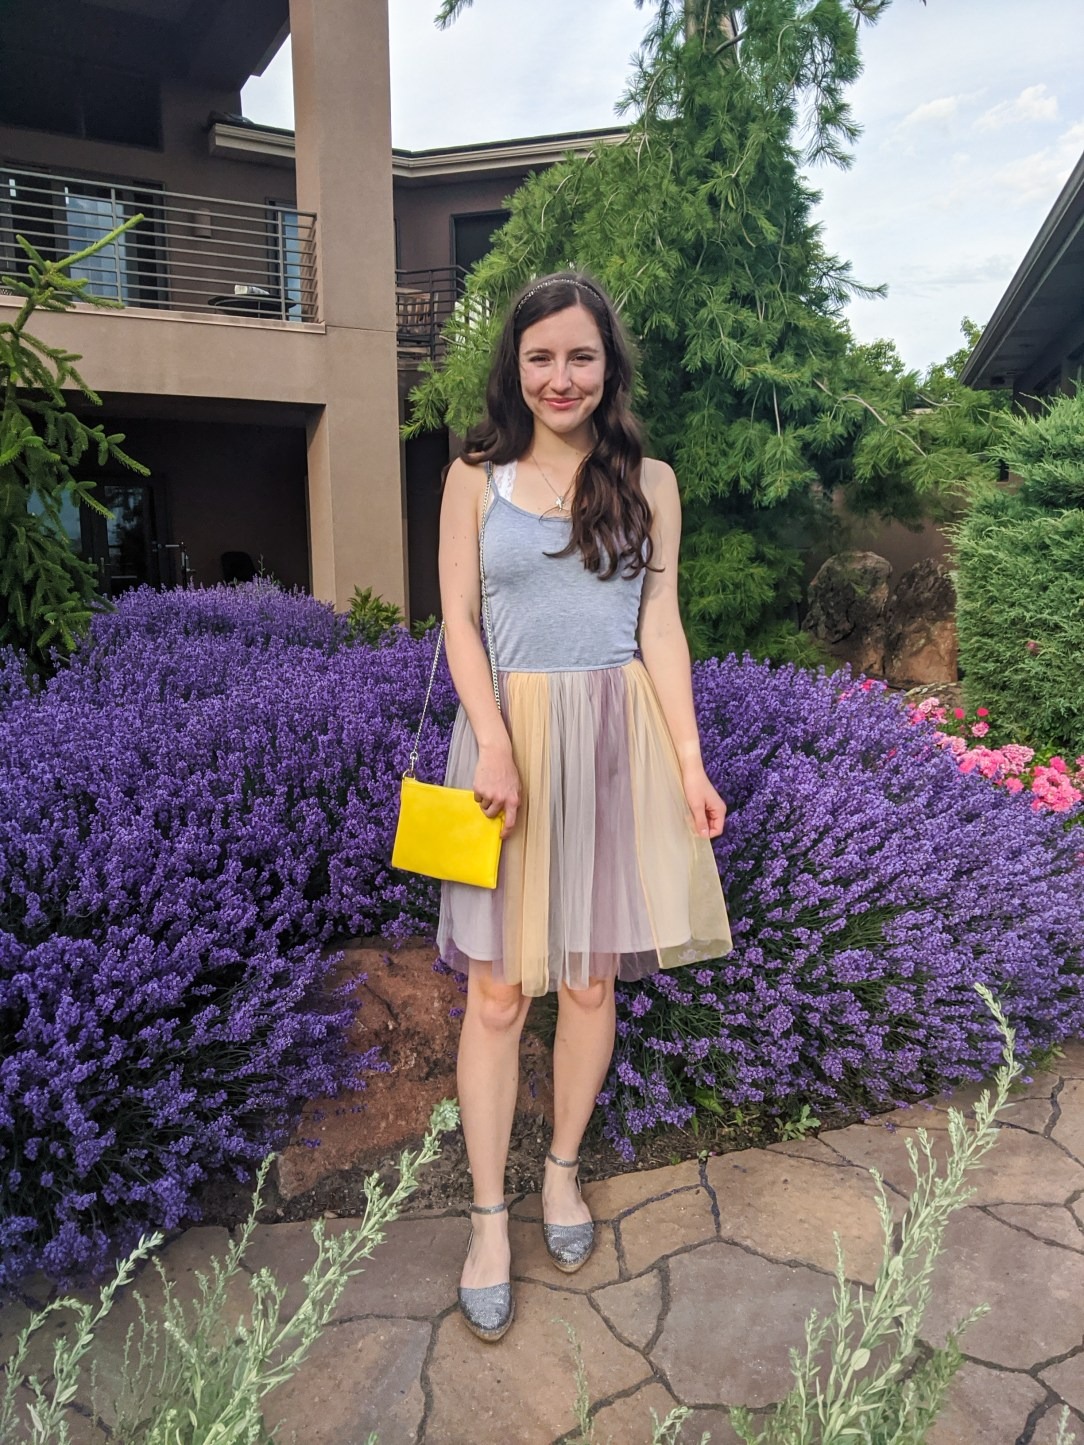 tulle-dress-espadrilles-college-fashion-blogger